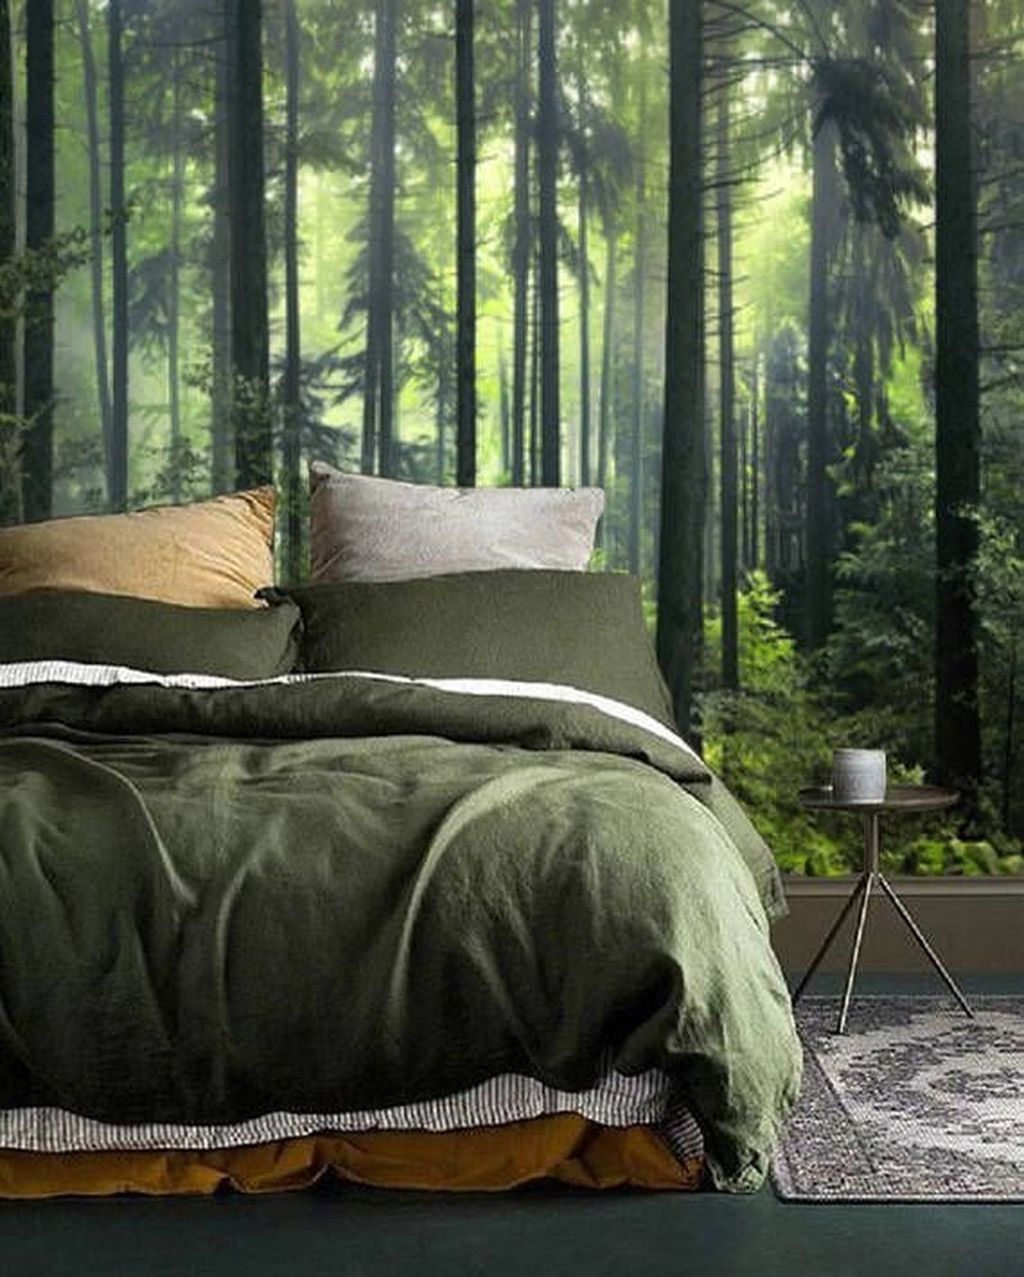 Bedroom Decor Gold Bedroom Decor Black Ideas For Bedroom Decor Cheap 3d Bedroom Decor In 2020 Wallpaper Design For Bedroom Forest Theme Bedrooms Wallpaper Bedroom